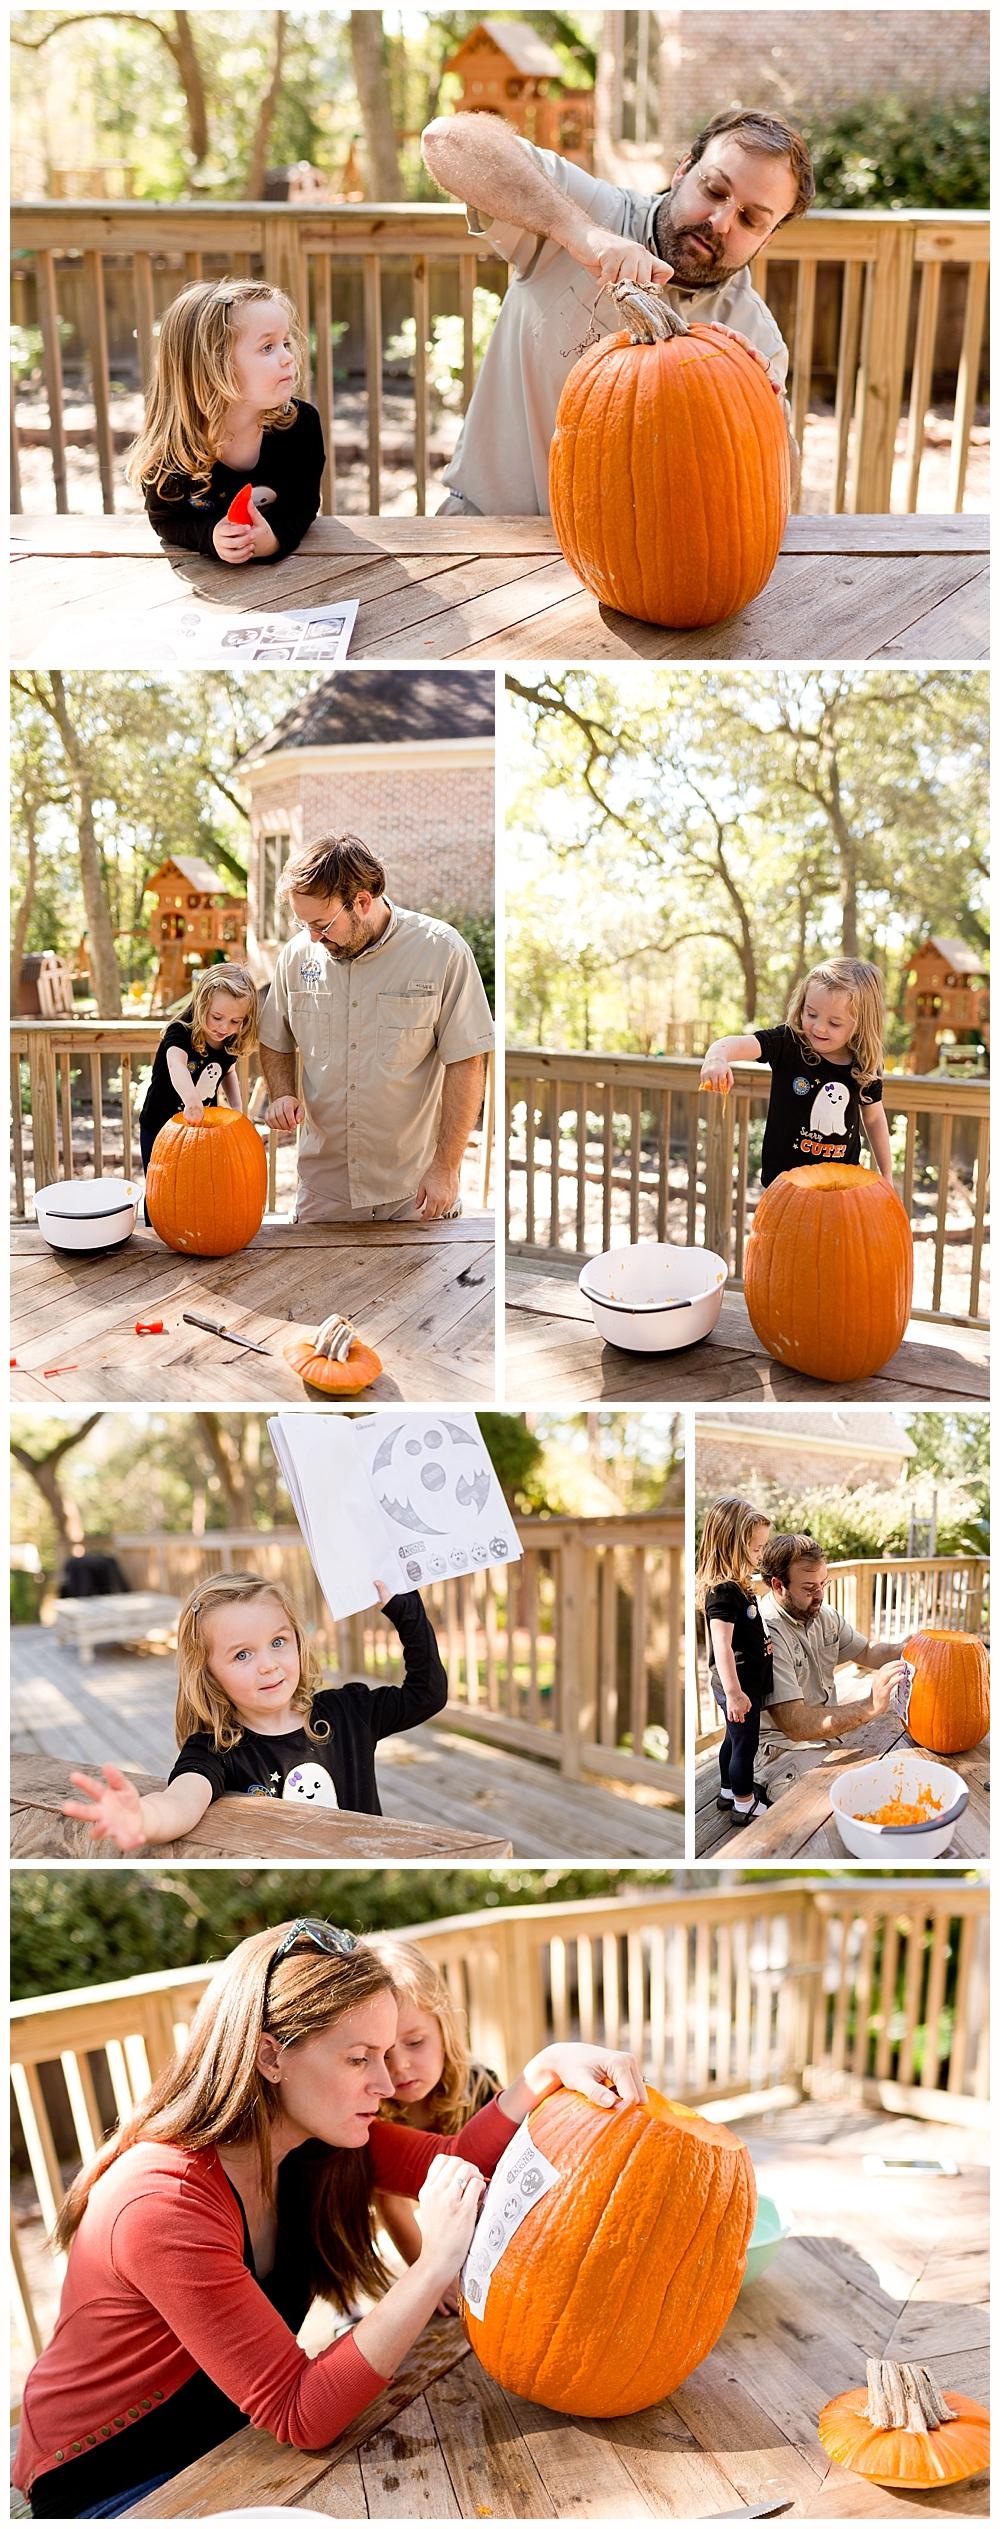 Mom, Dad, and 3-year-old daughter carving pumpkin on back deck in Ocean Springs, MS